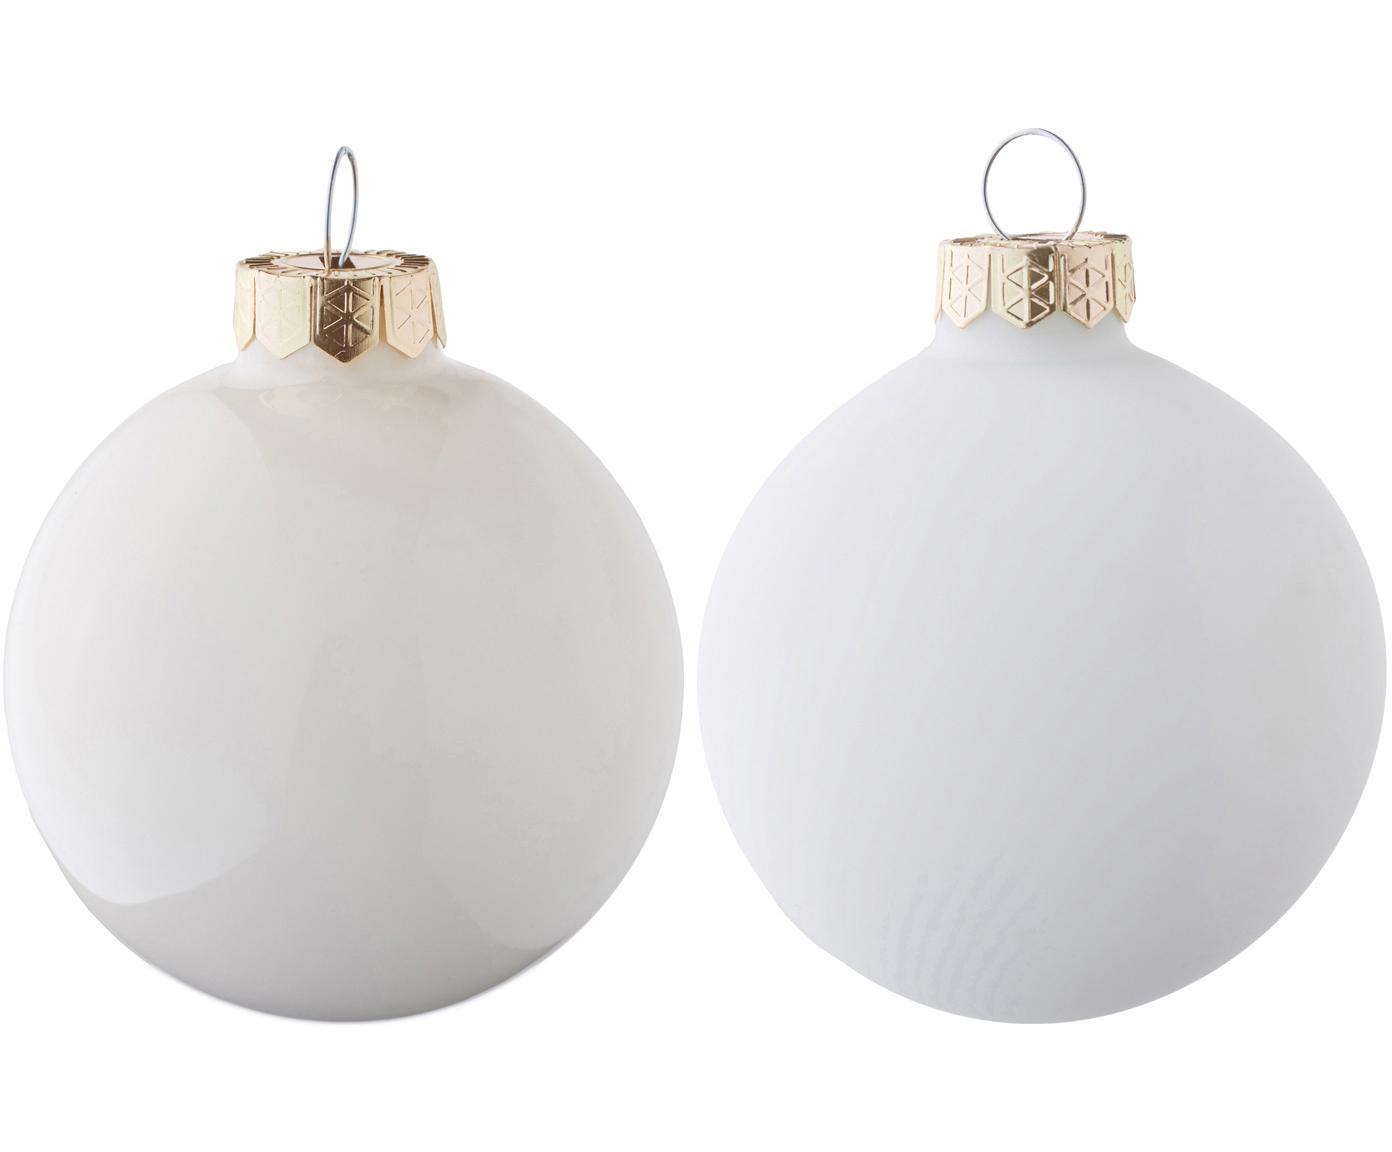 Weihnachtskugel-Set EvergreenØ6cm, 10-tlg., Cremefarben, Ø 6 cm